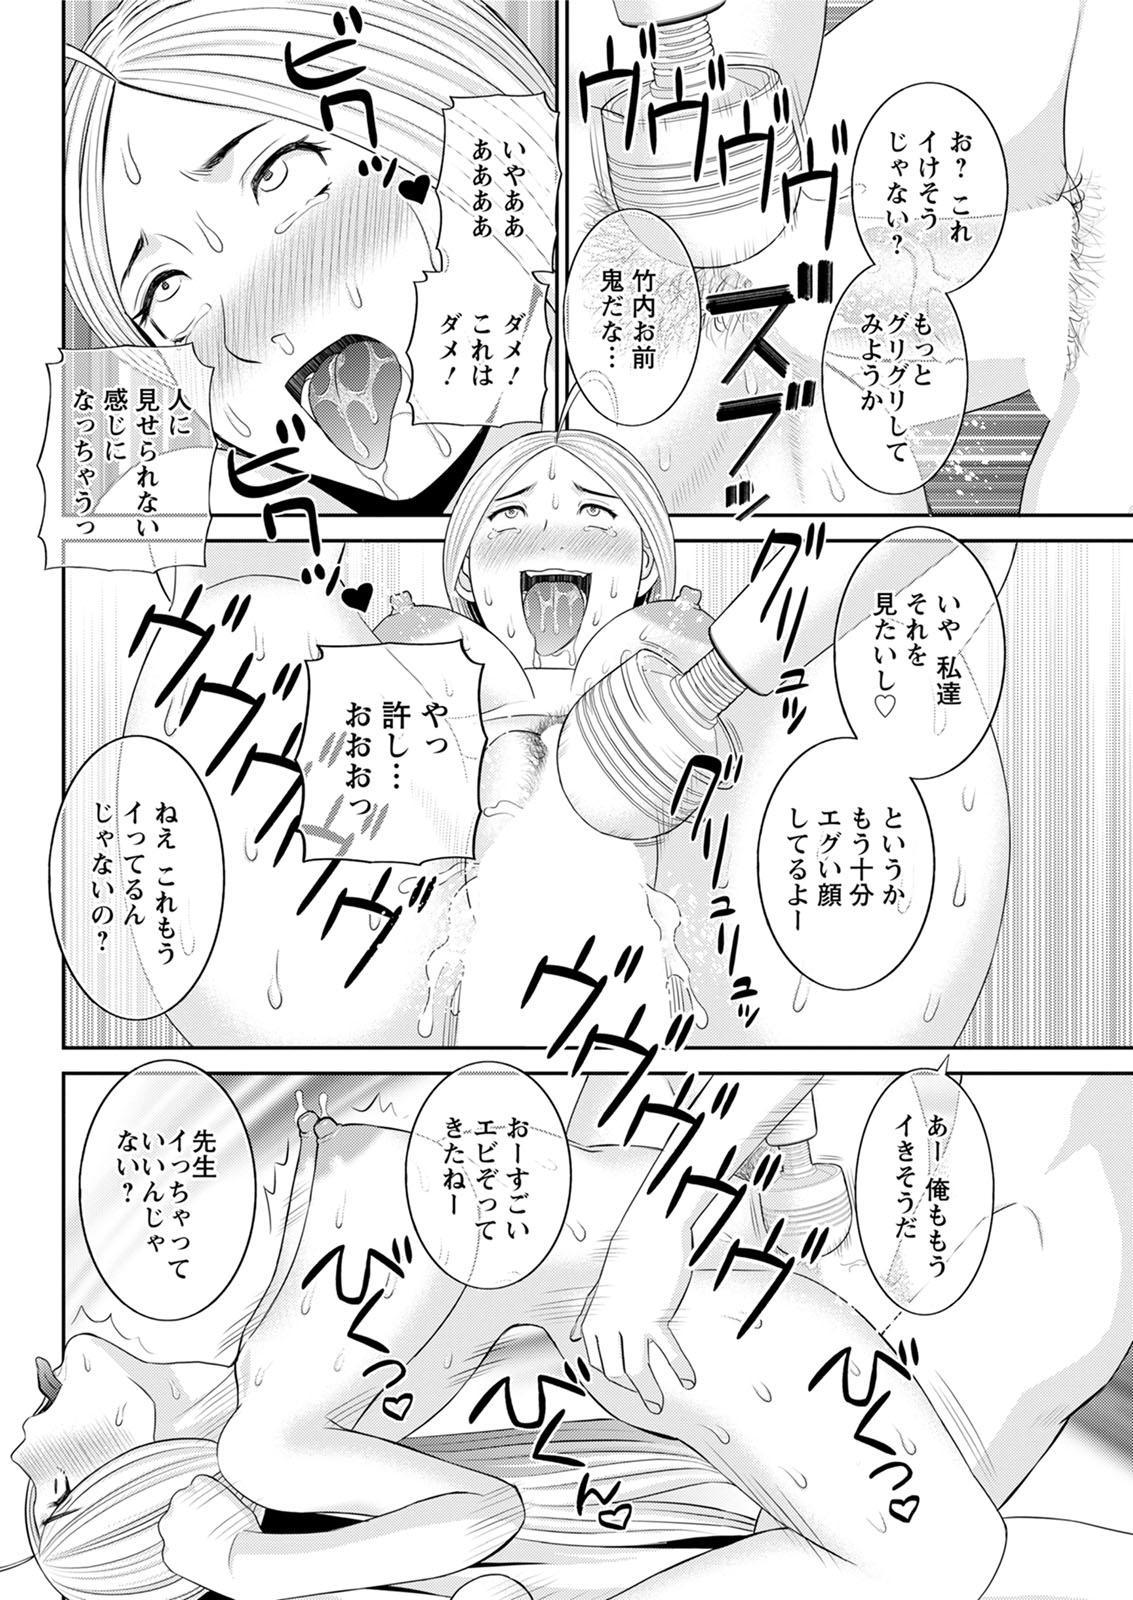 [Kawamori Misaki] Kaikan Hitotsuma Gakuen Ch. 1-6, 8-20 [Digital] 270